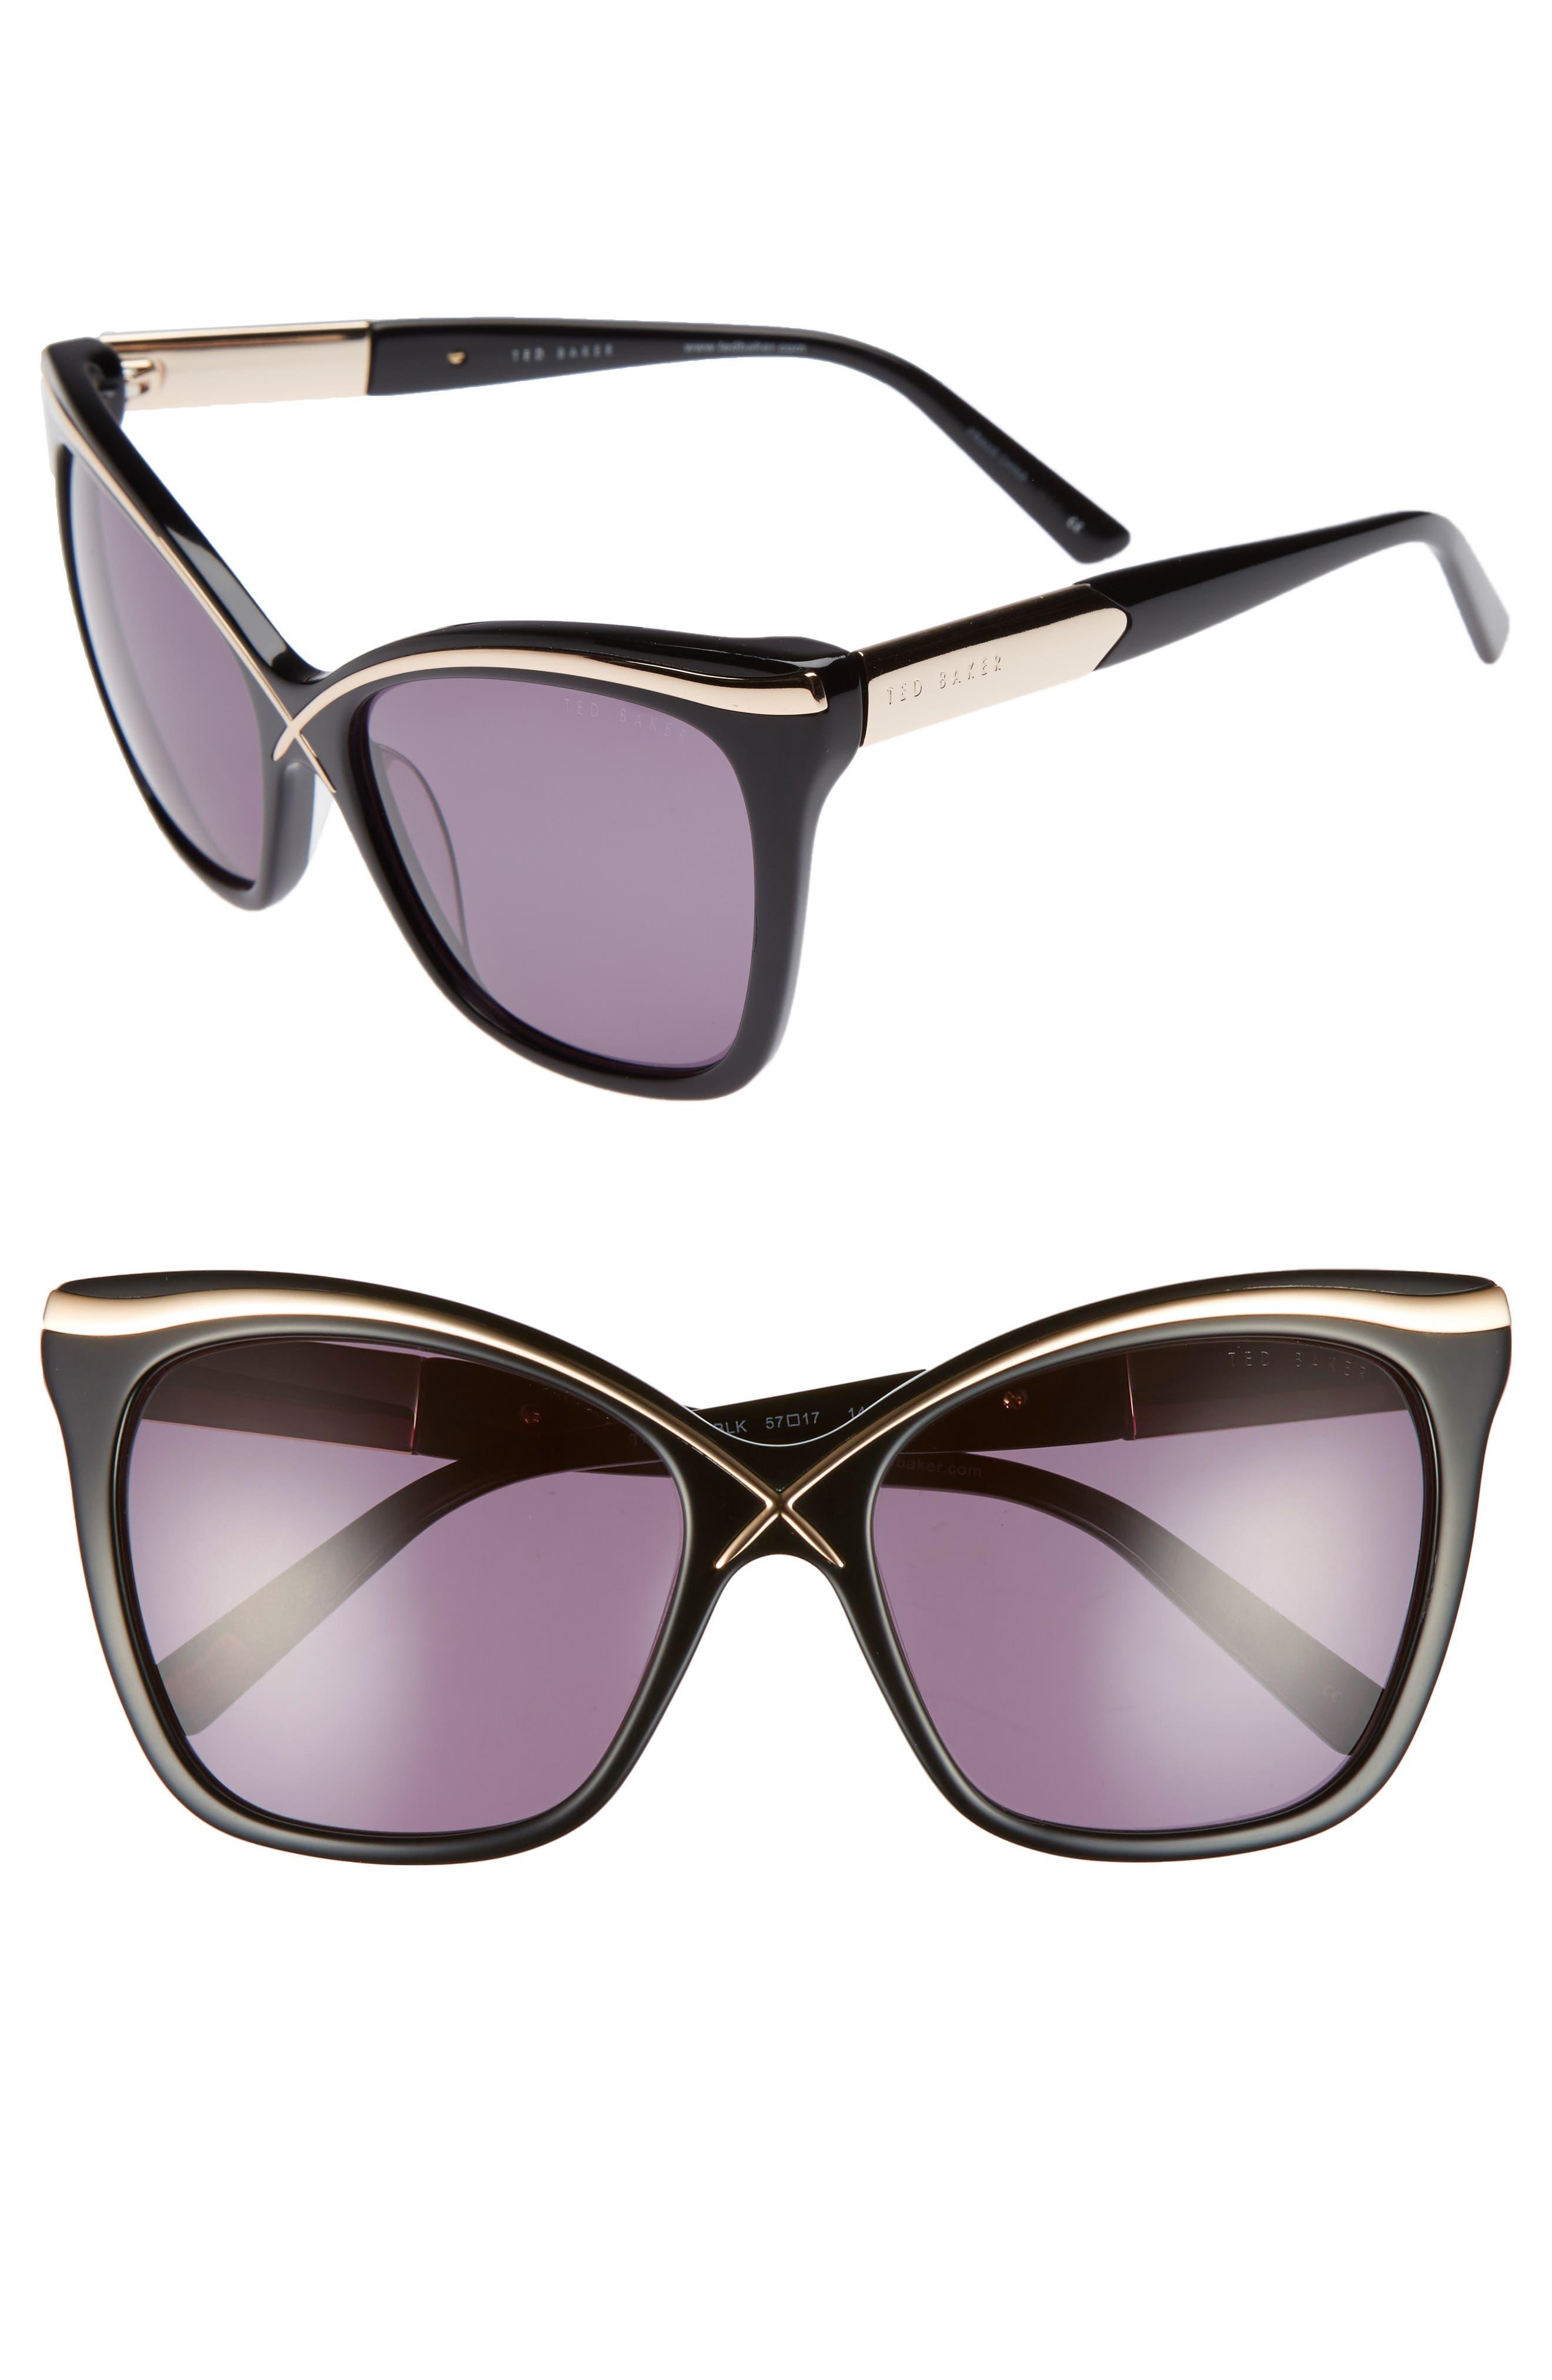 57mm Square Cat Eye Sunglasses,                         Main,                         color,